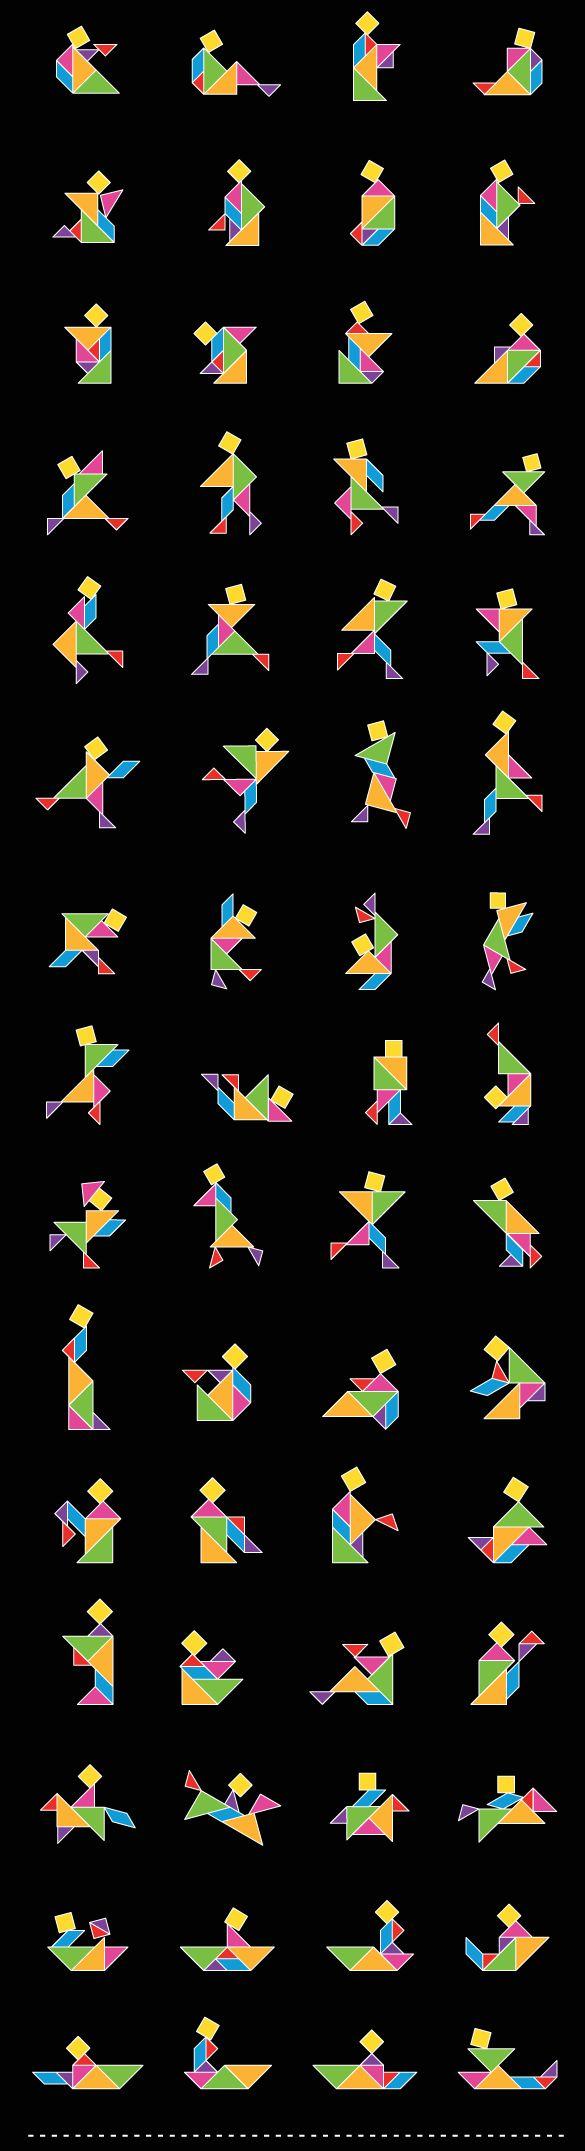 Walls360 Blog » Wall Tangrams: Shapes Guide I (Multi-Color)